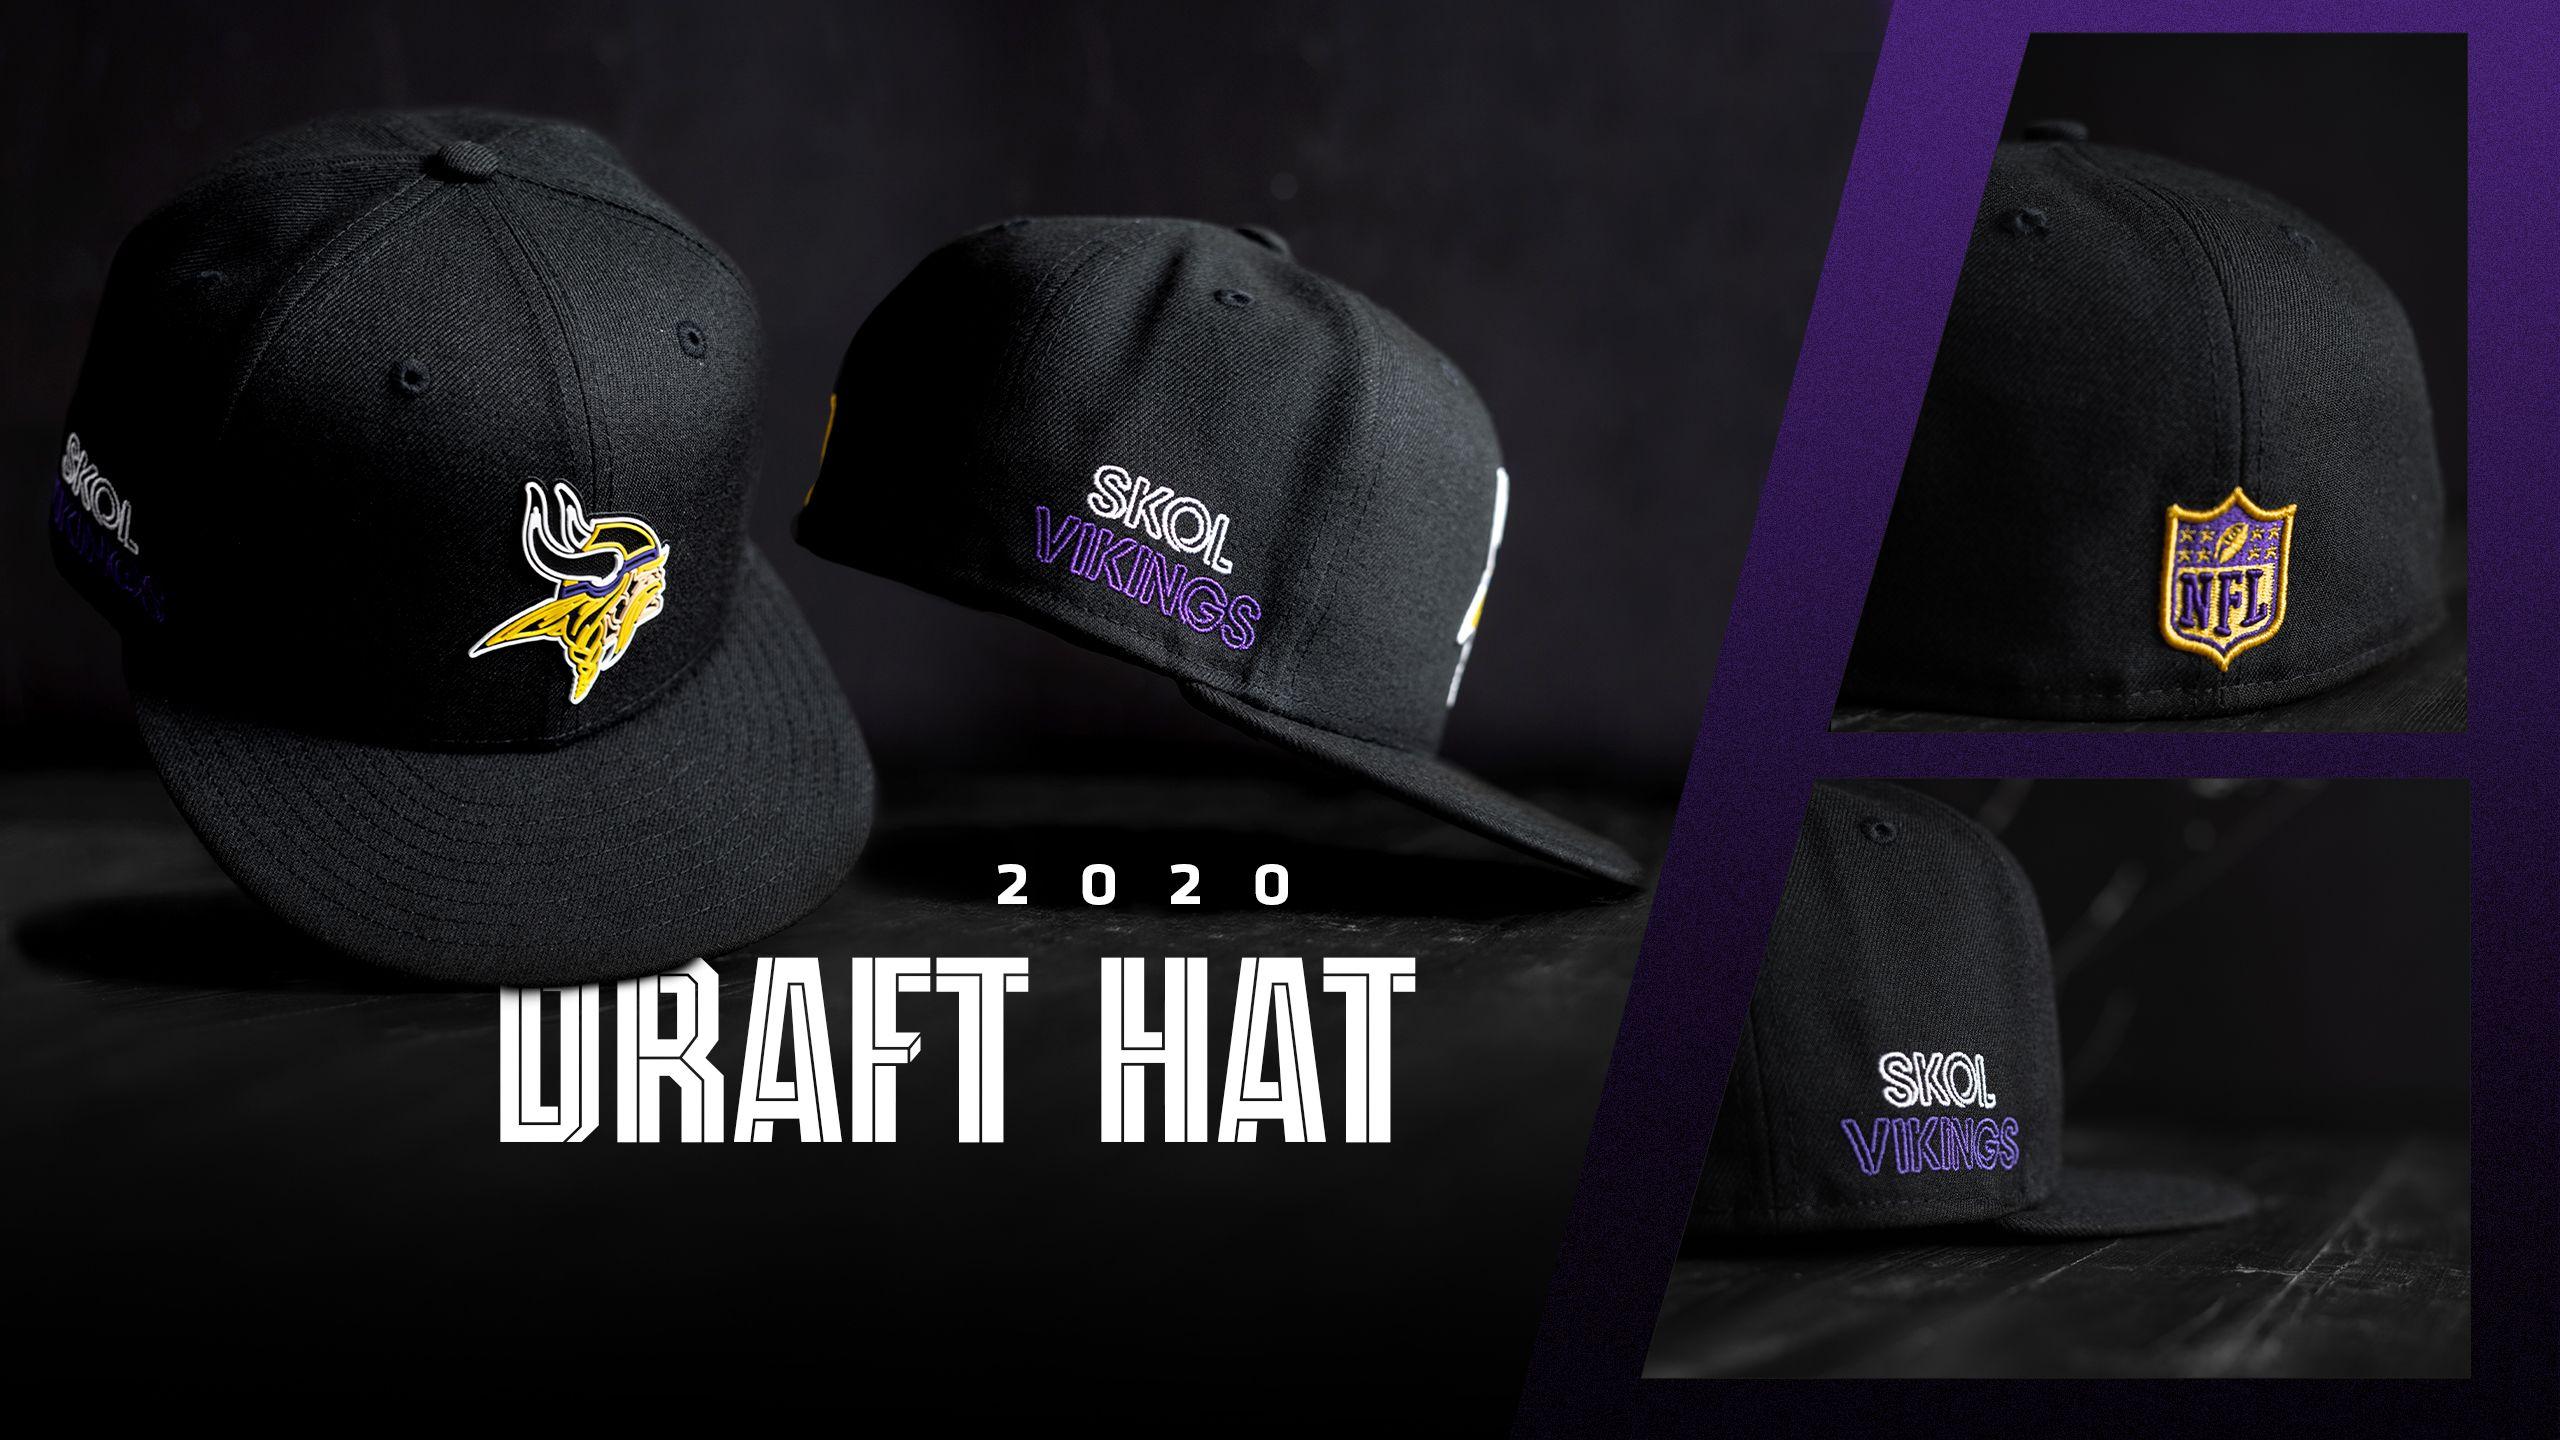 2020 Draft Gear